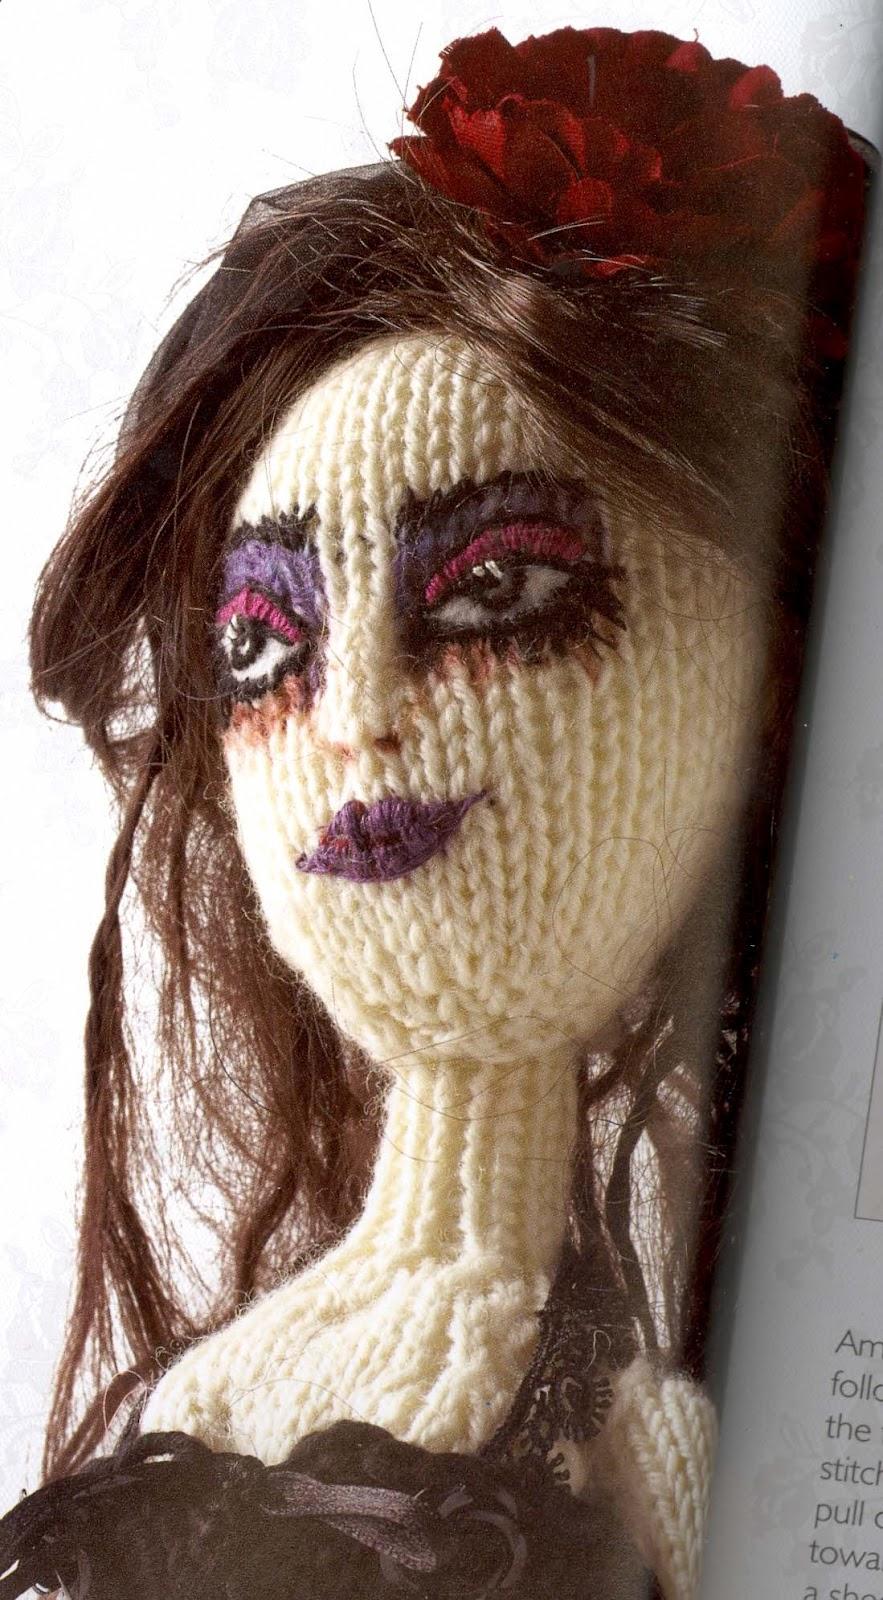 BeadBag: Gothic Knits - knitting punk dolls!